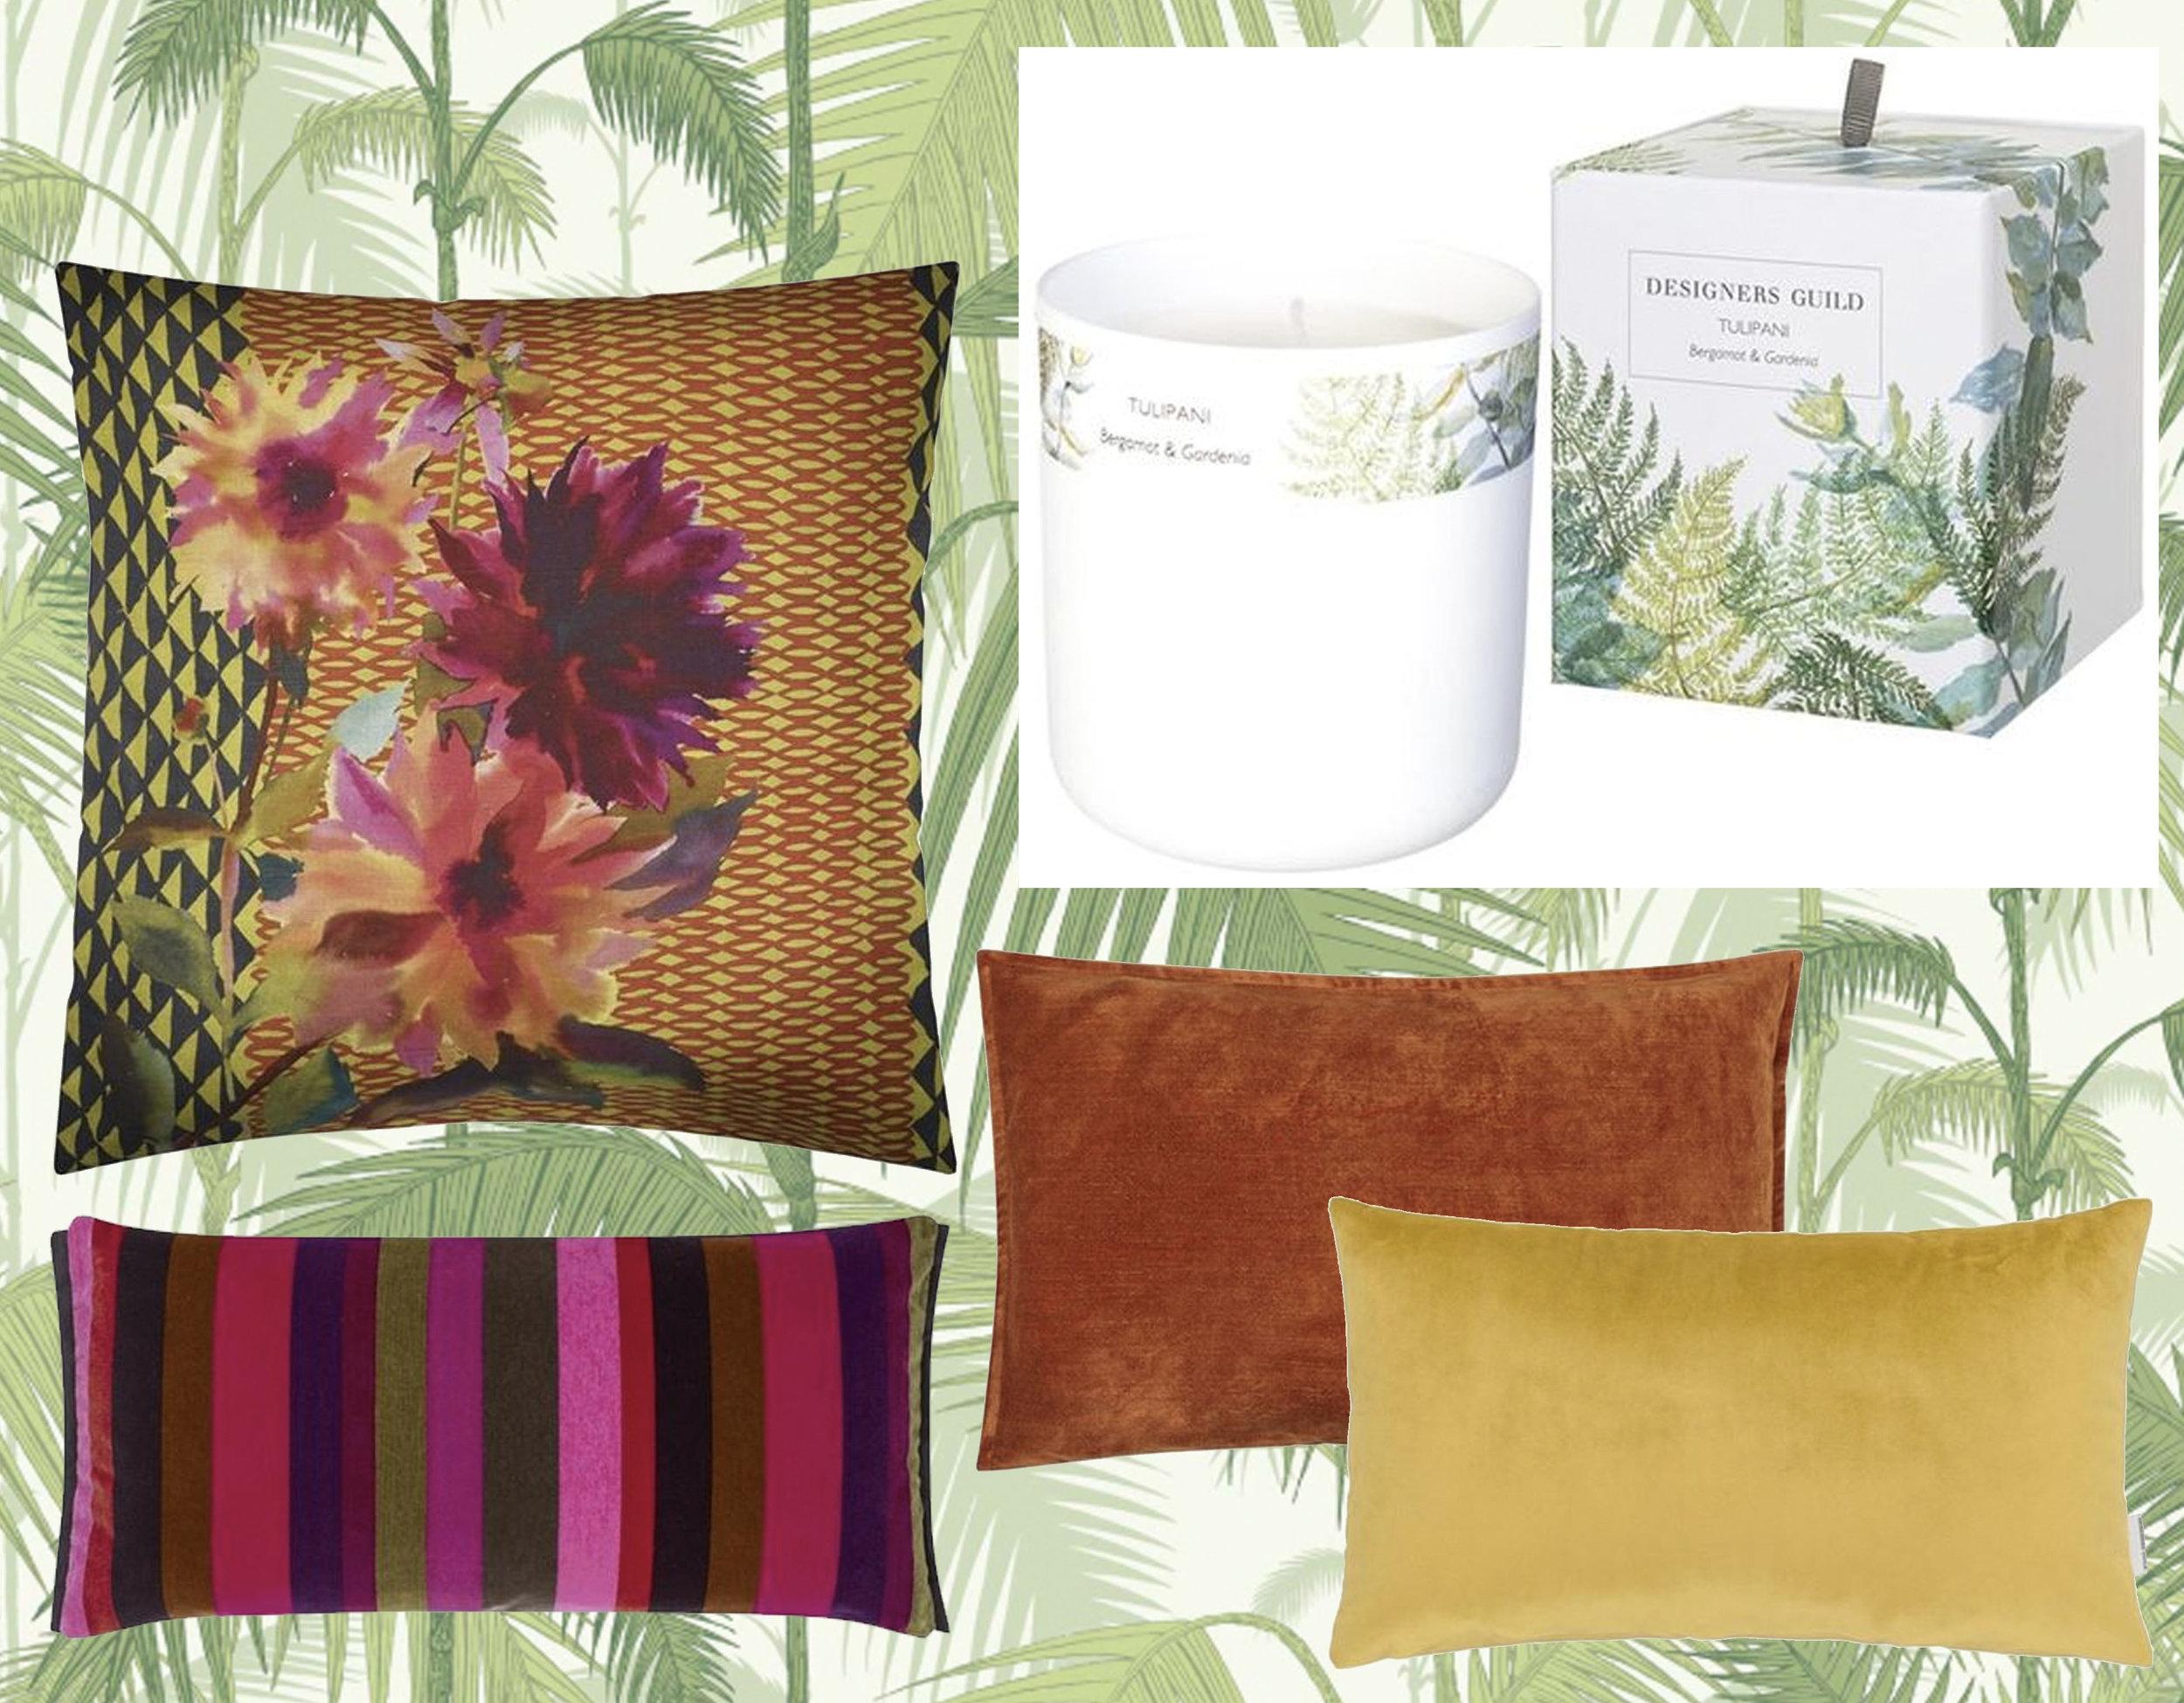 wallpaper Palm Jungle    Cole & Son  - cushions  Designers Guild  - fragranced candle  Designers Guild